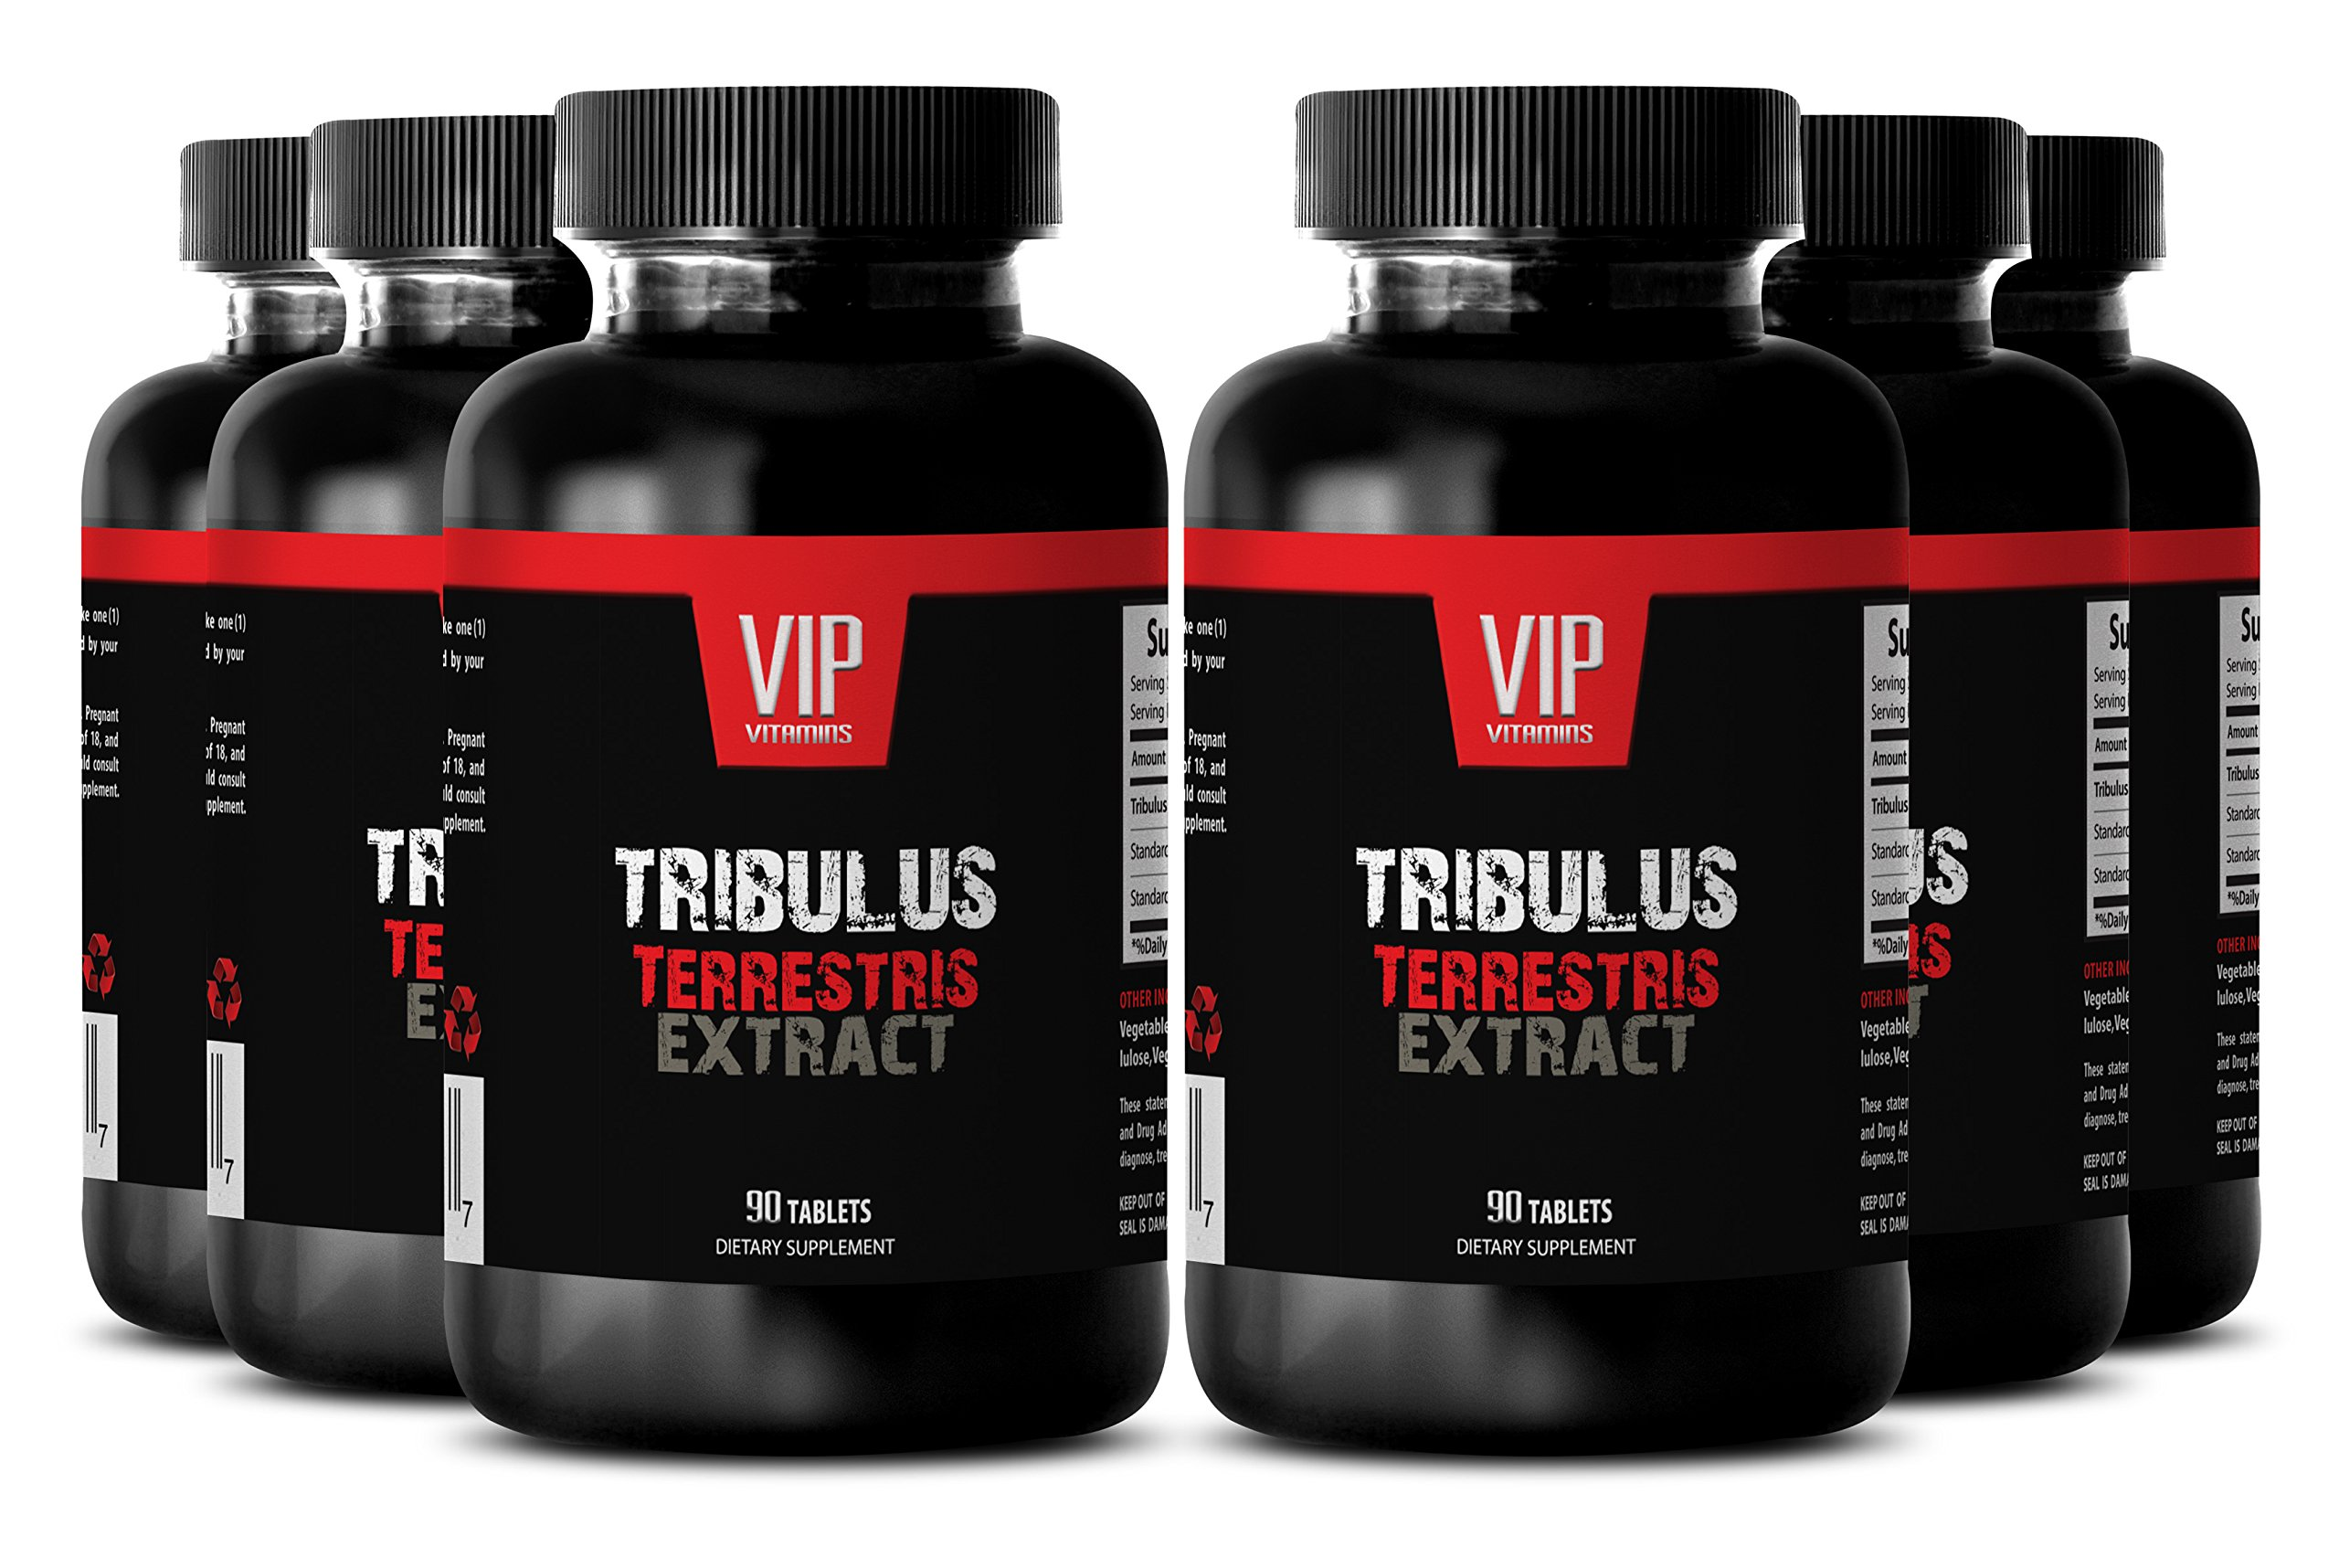 King Size Male Enhancing Pills - TRIBULUS TERRESTRIS PREMIUM EXTRACT 1000mg - Natural tribulus testosterone booster - 6 Bottles 540 Tablets